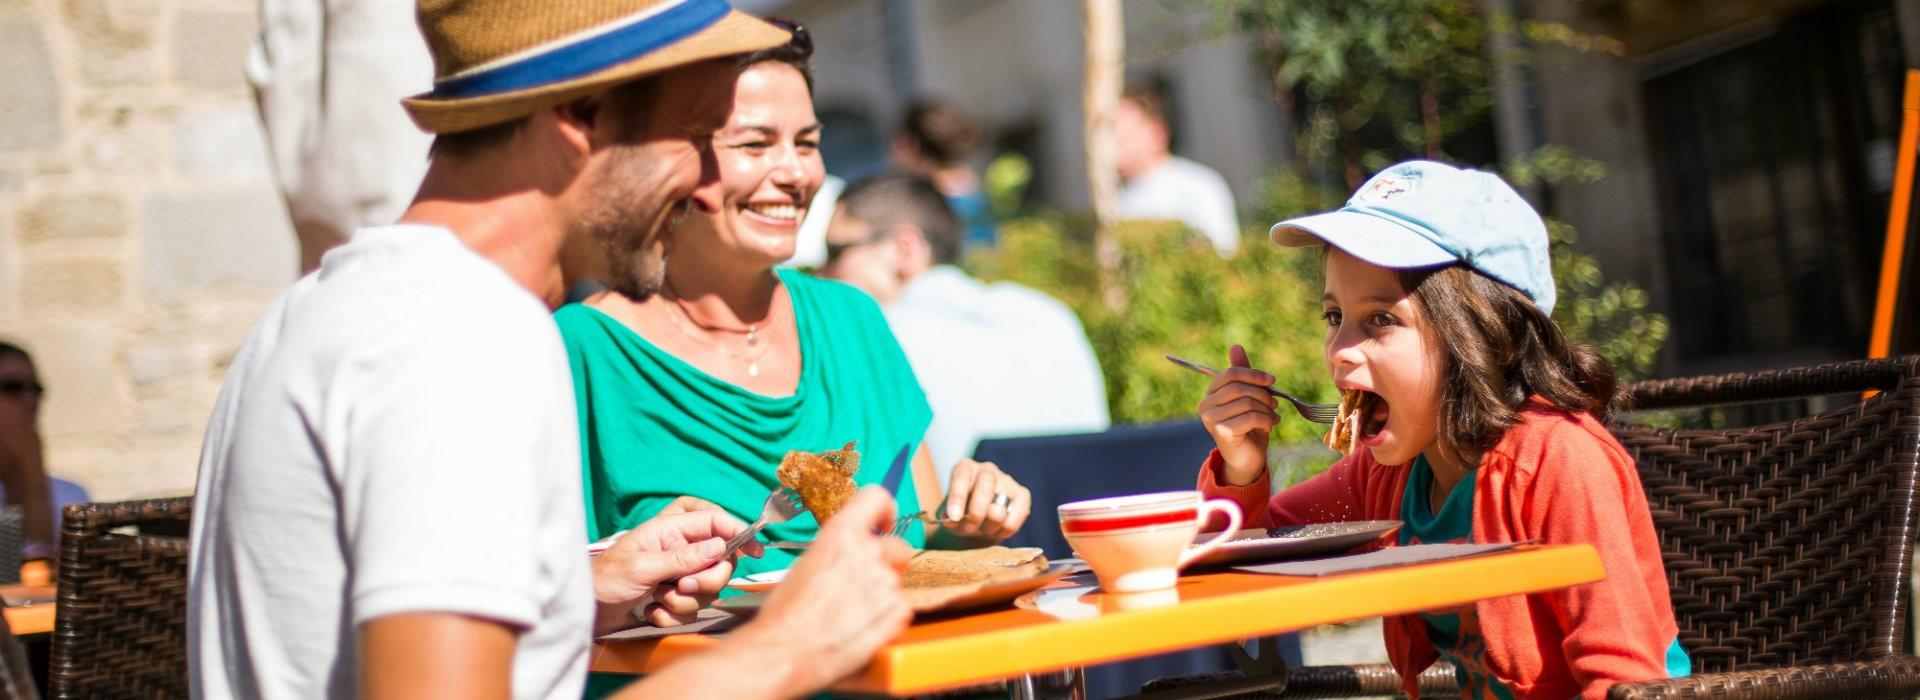 Restaurants - CRT Bretagne / Alexandre Lamoureux